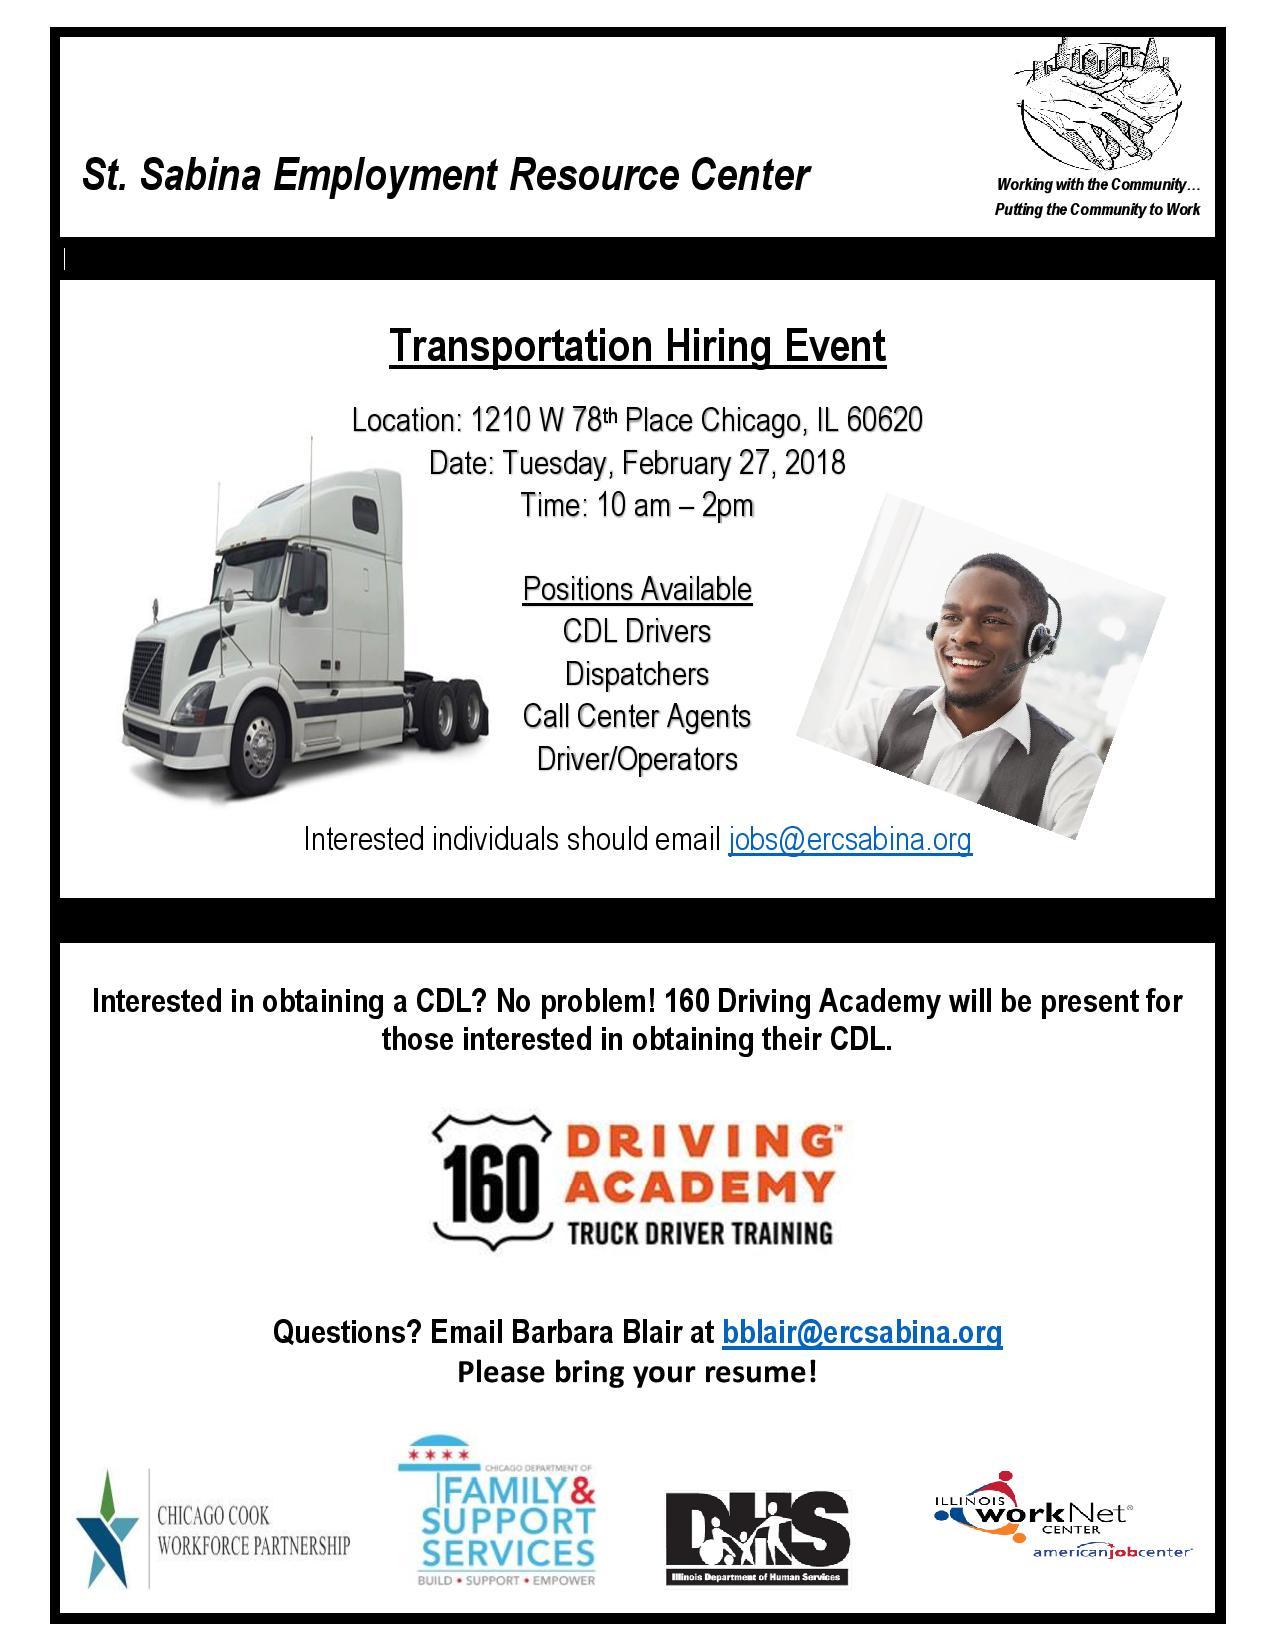 Transportation Hiring Event (1)-page-001.jpg